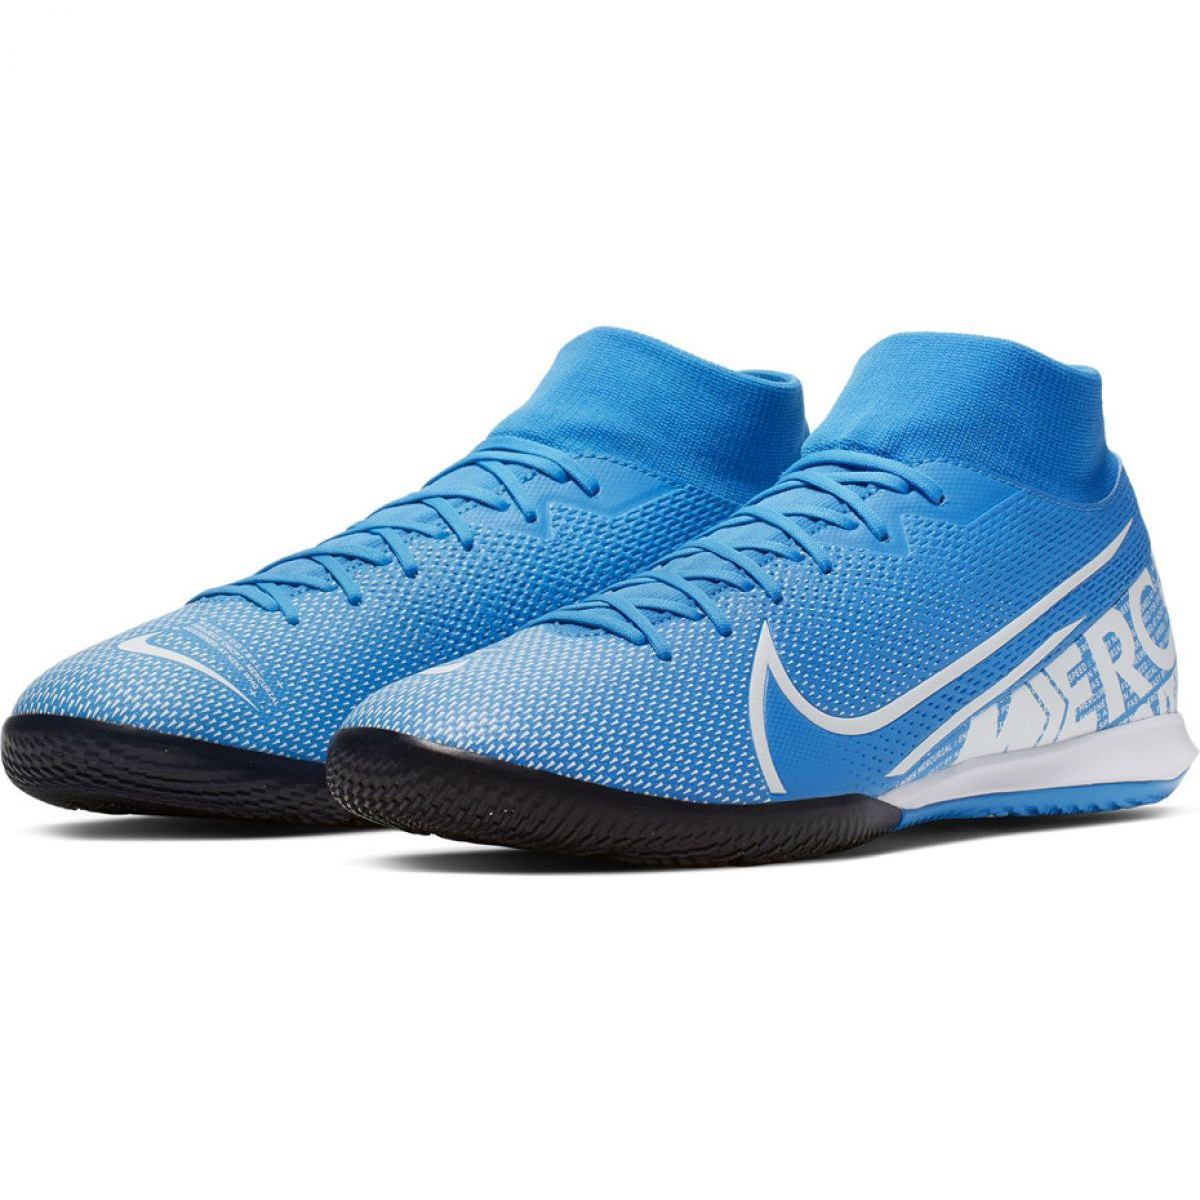 Fußballschuhe Nike Mercurial Superfly 7 Akademie Ic M AT7975 414 blau